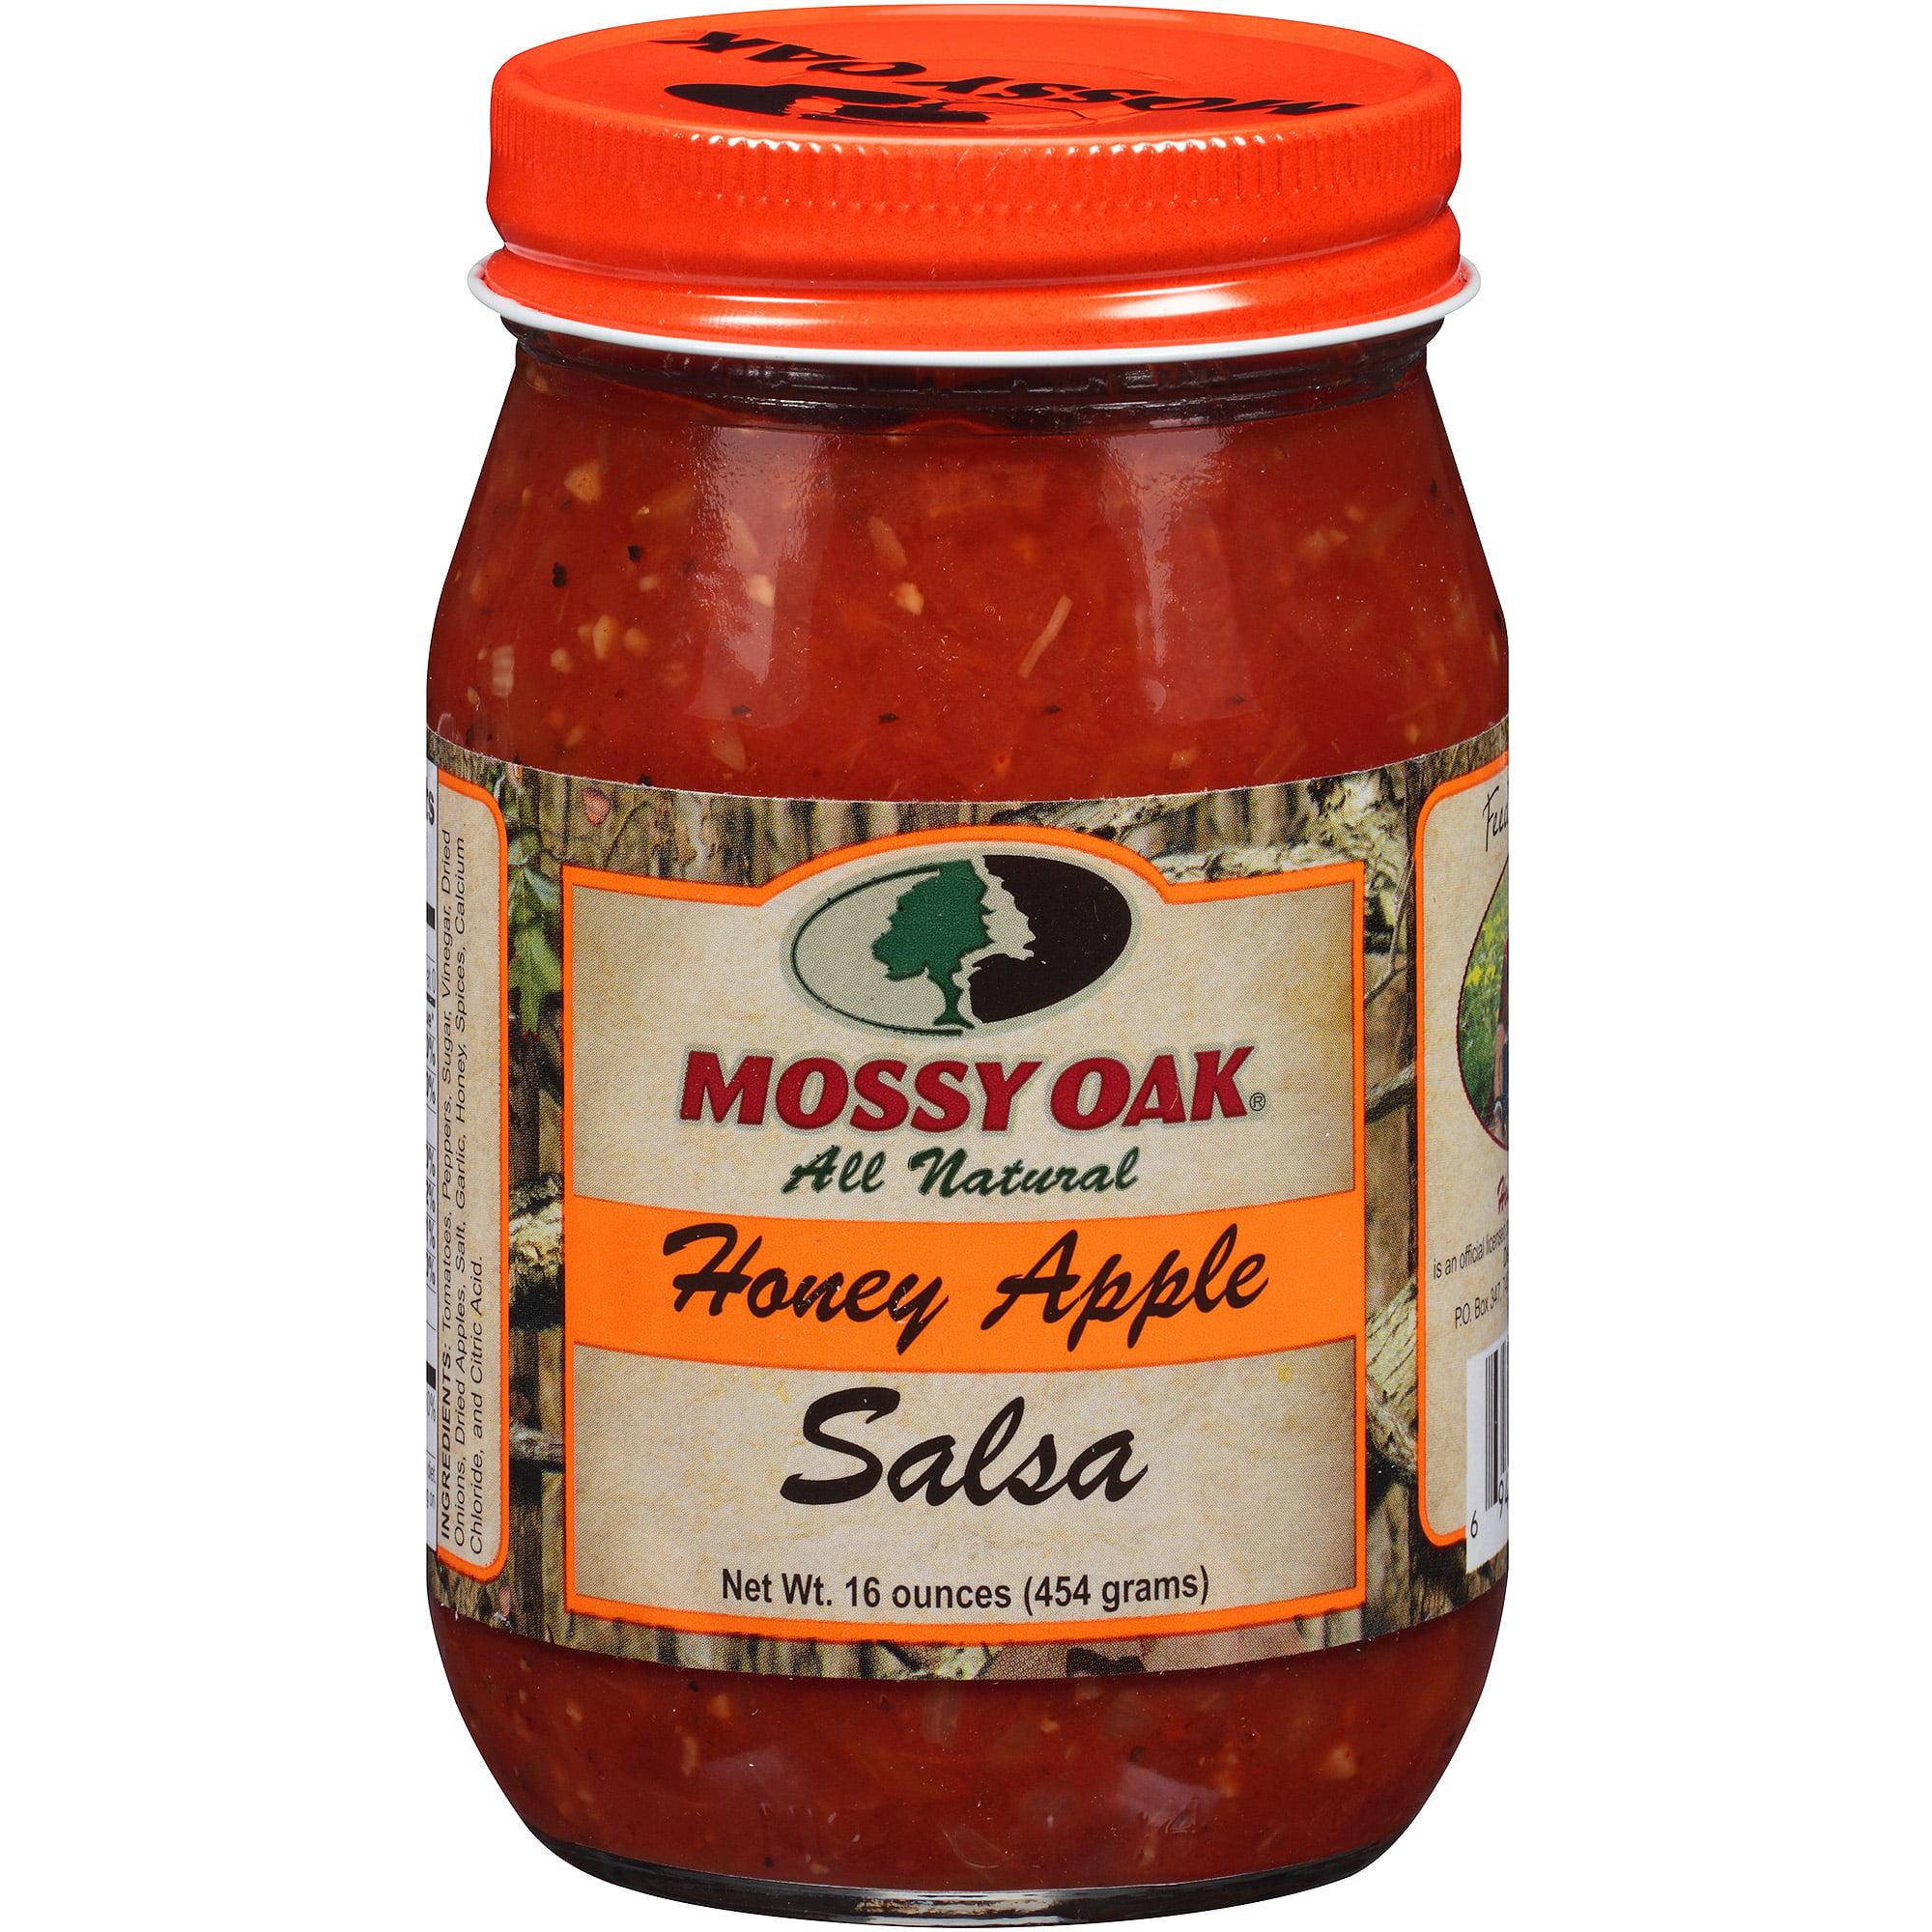 Mossy Oak All Natural Honey Apple Salsa, 16 oz - Walmart.com